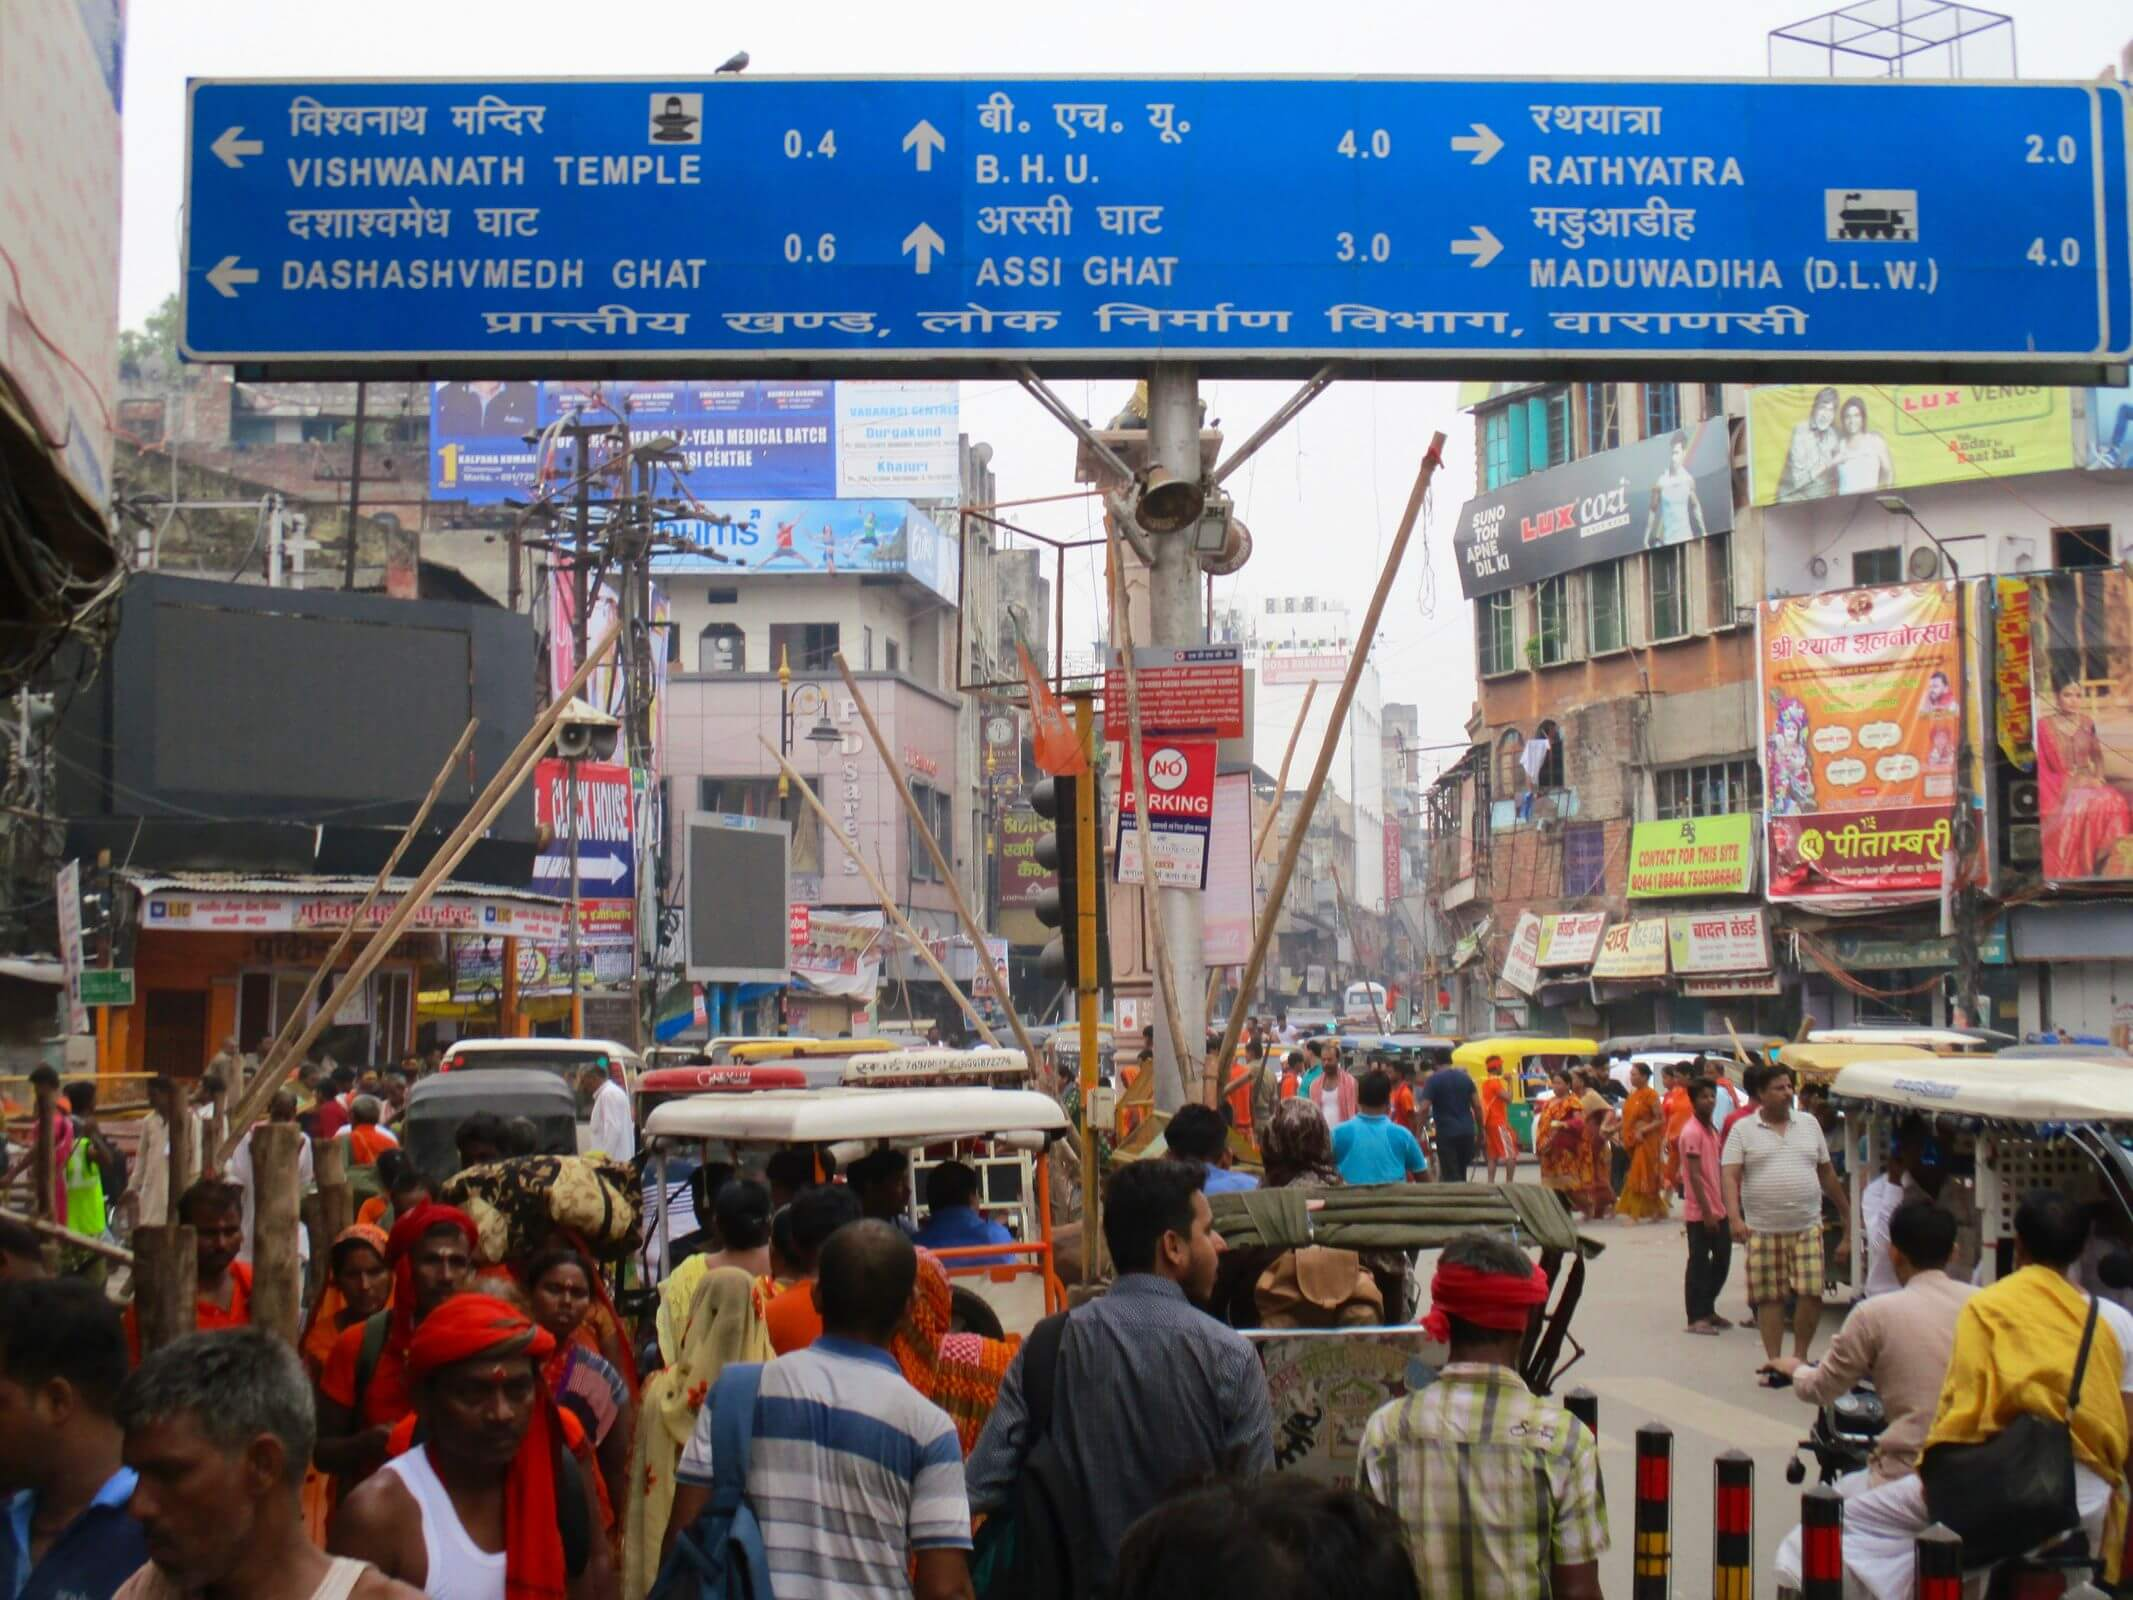 Varanasi sign crowd-1